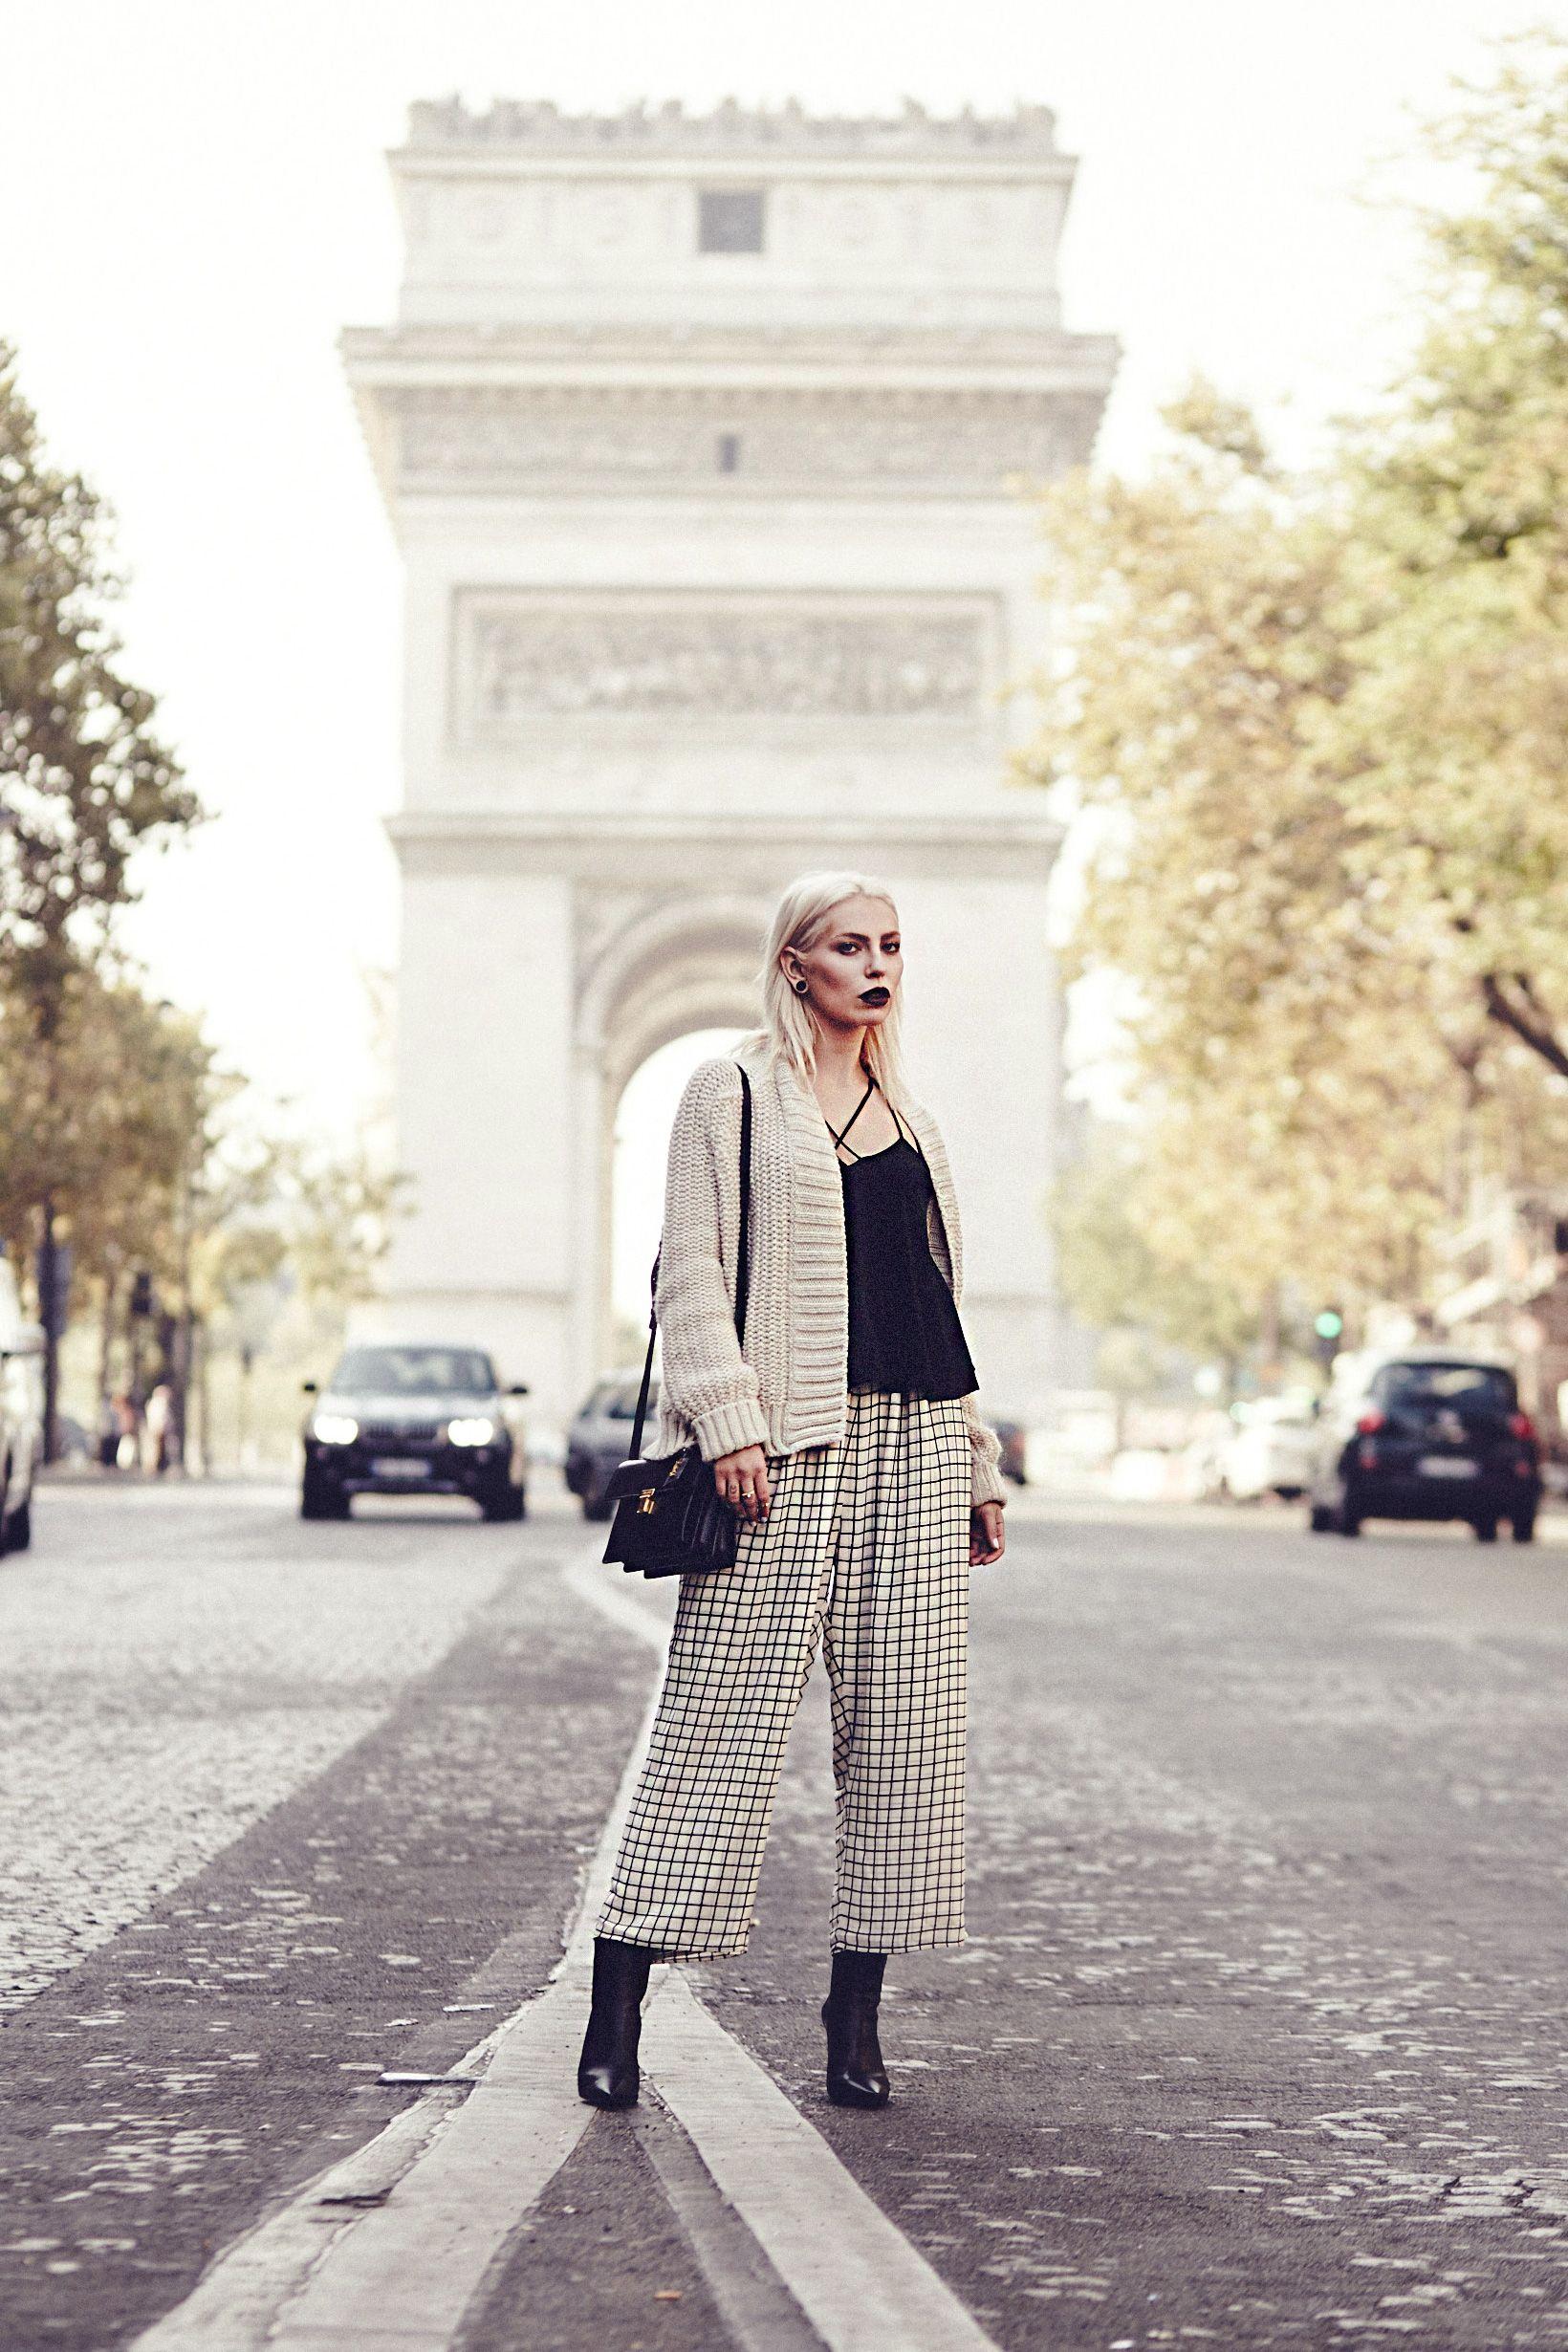 Arc de triomphe black and white dresses